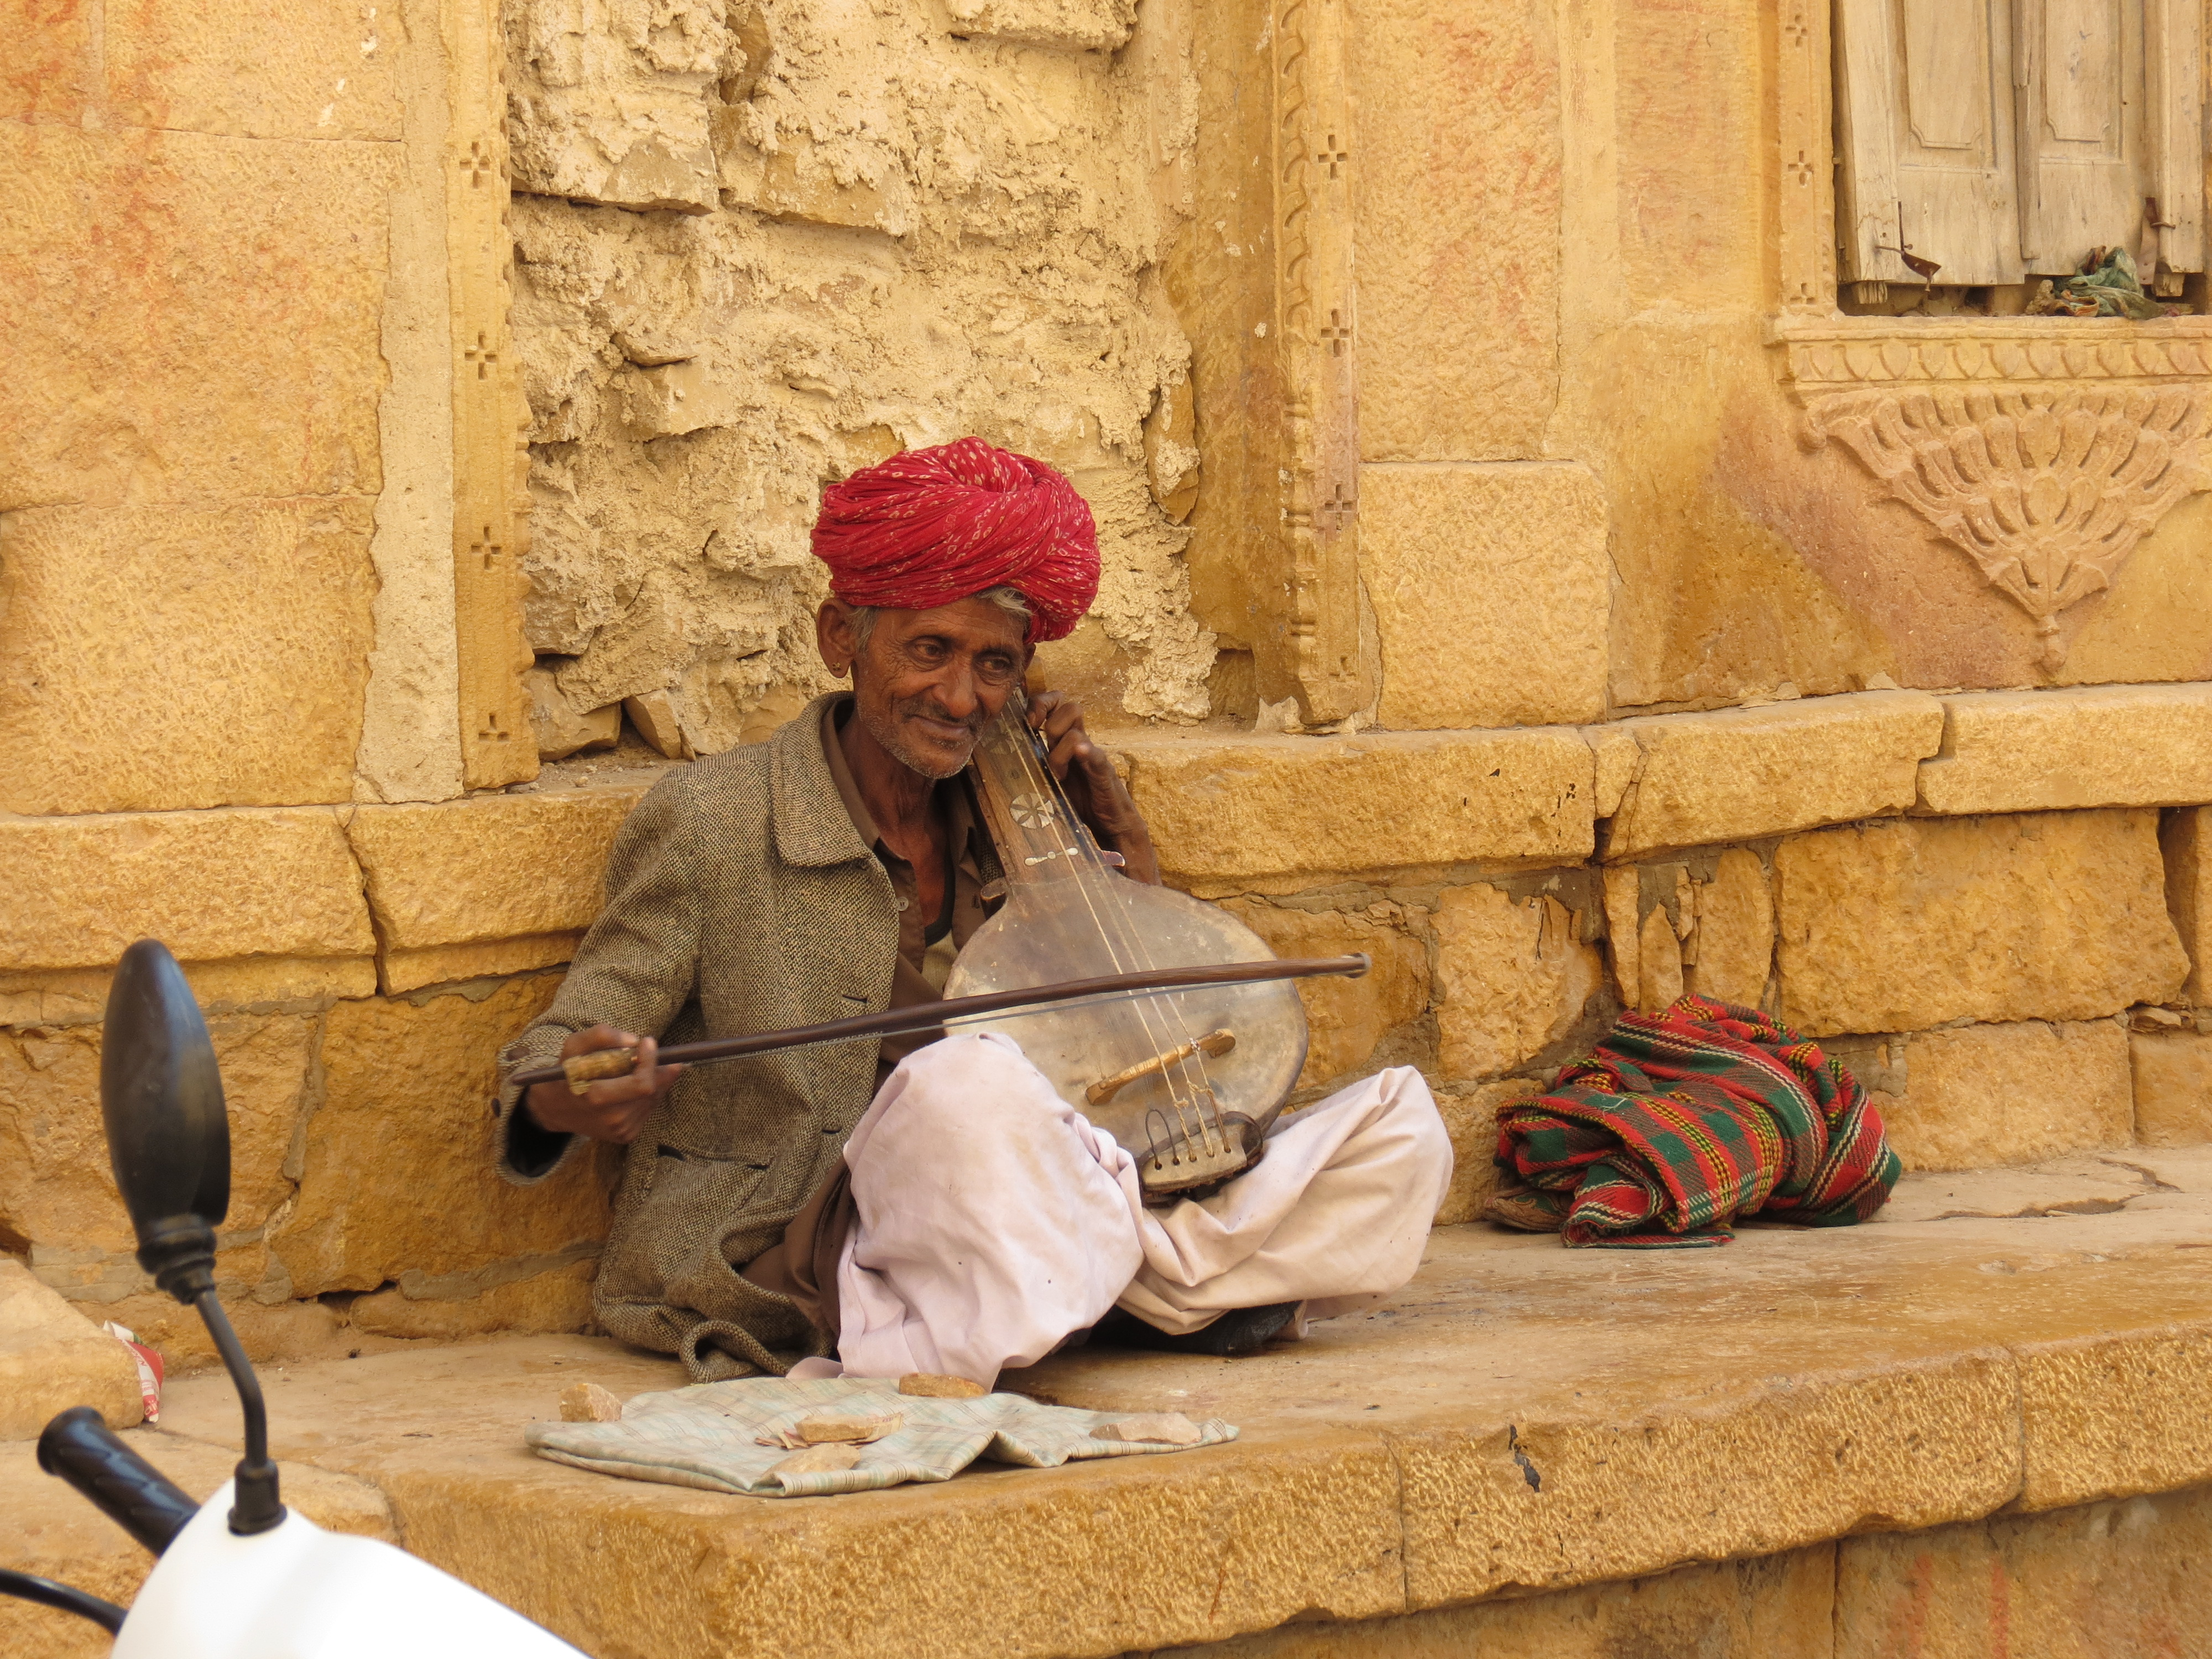 Luca Errera, Daniela Trastulli, India, Rajasthan, Jaisalmer, uomo, mendicante, musicista